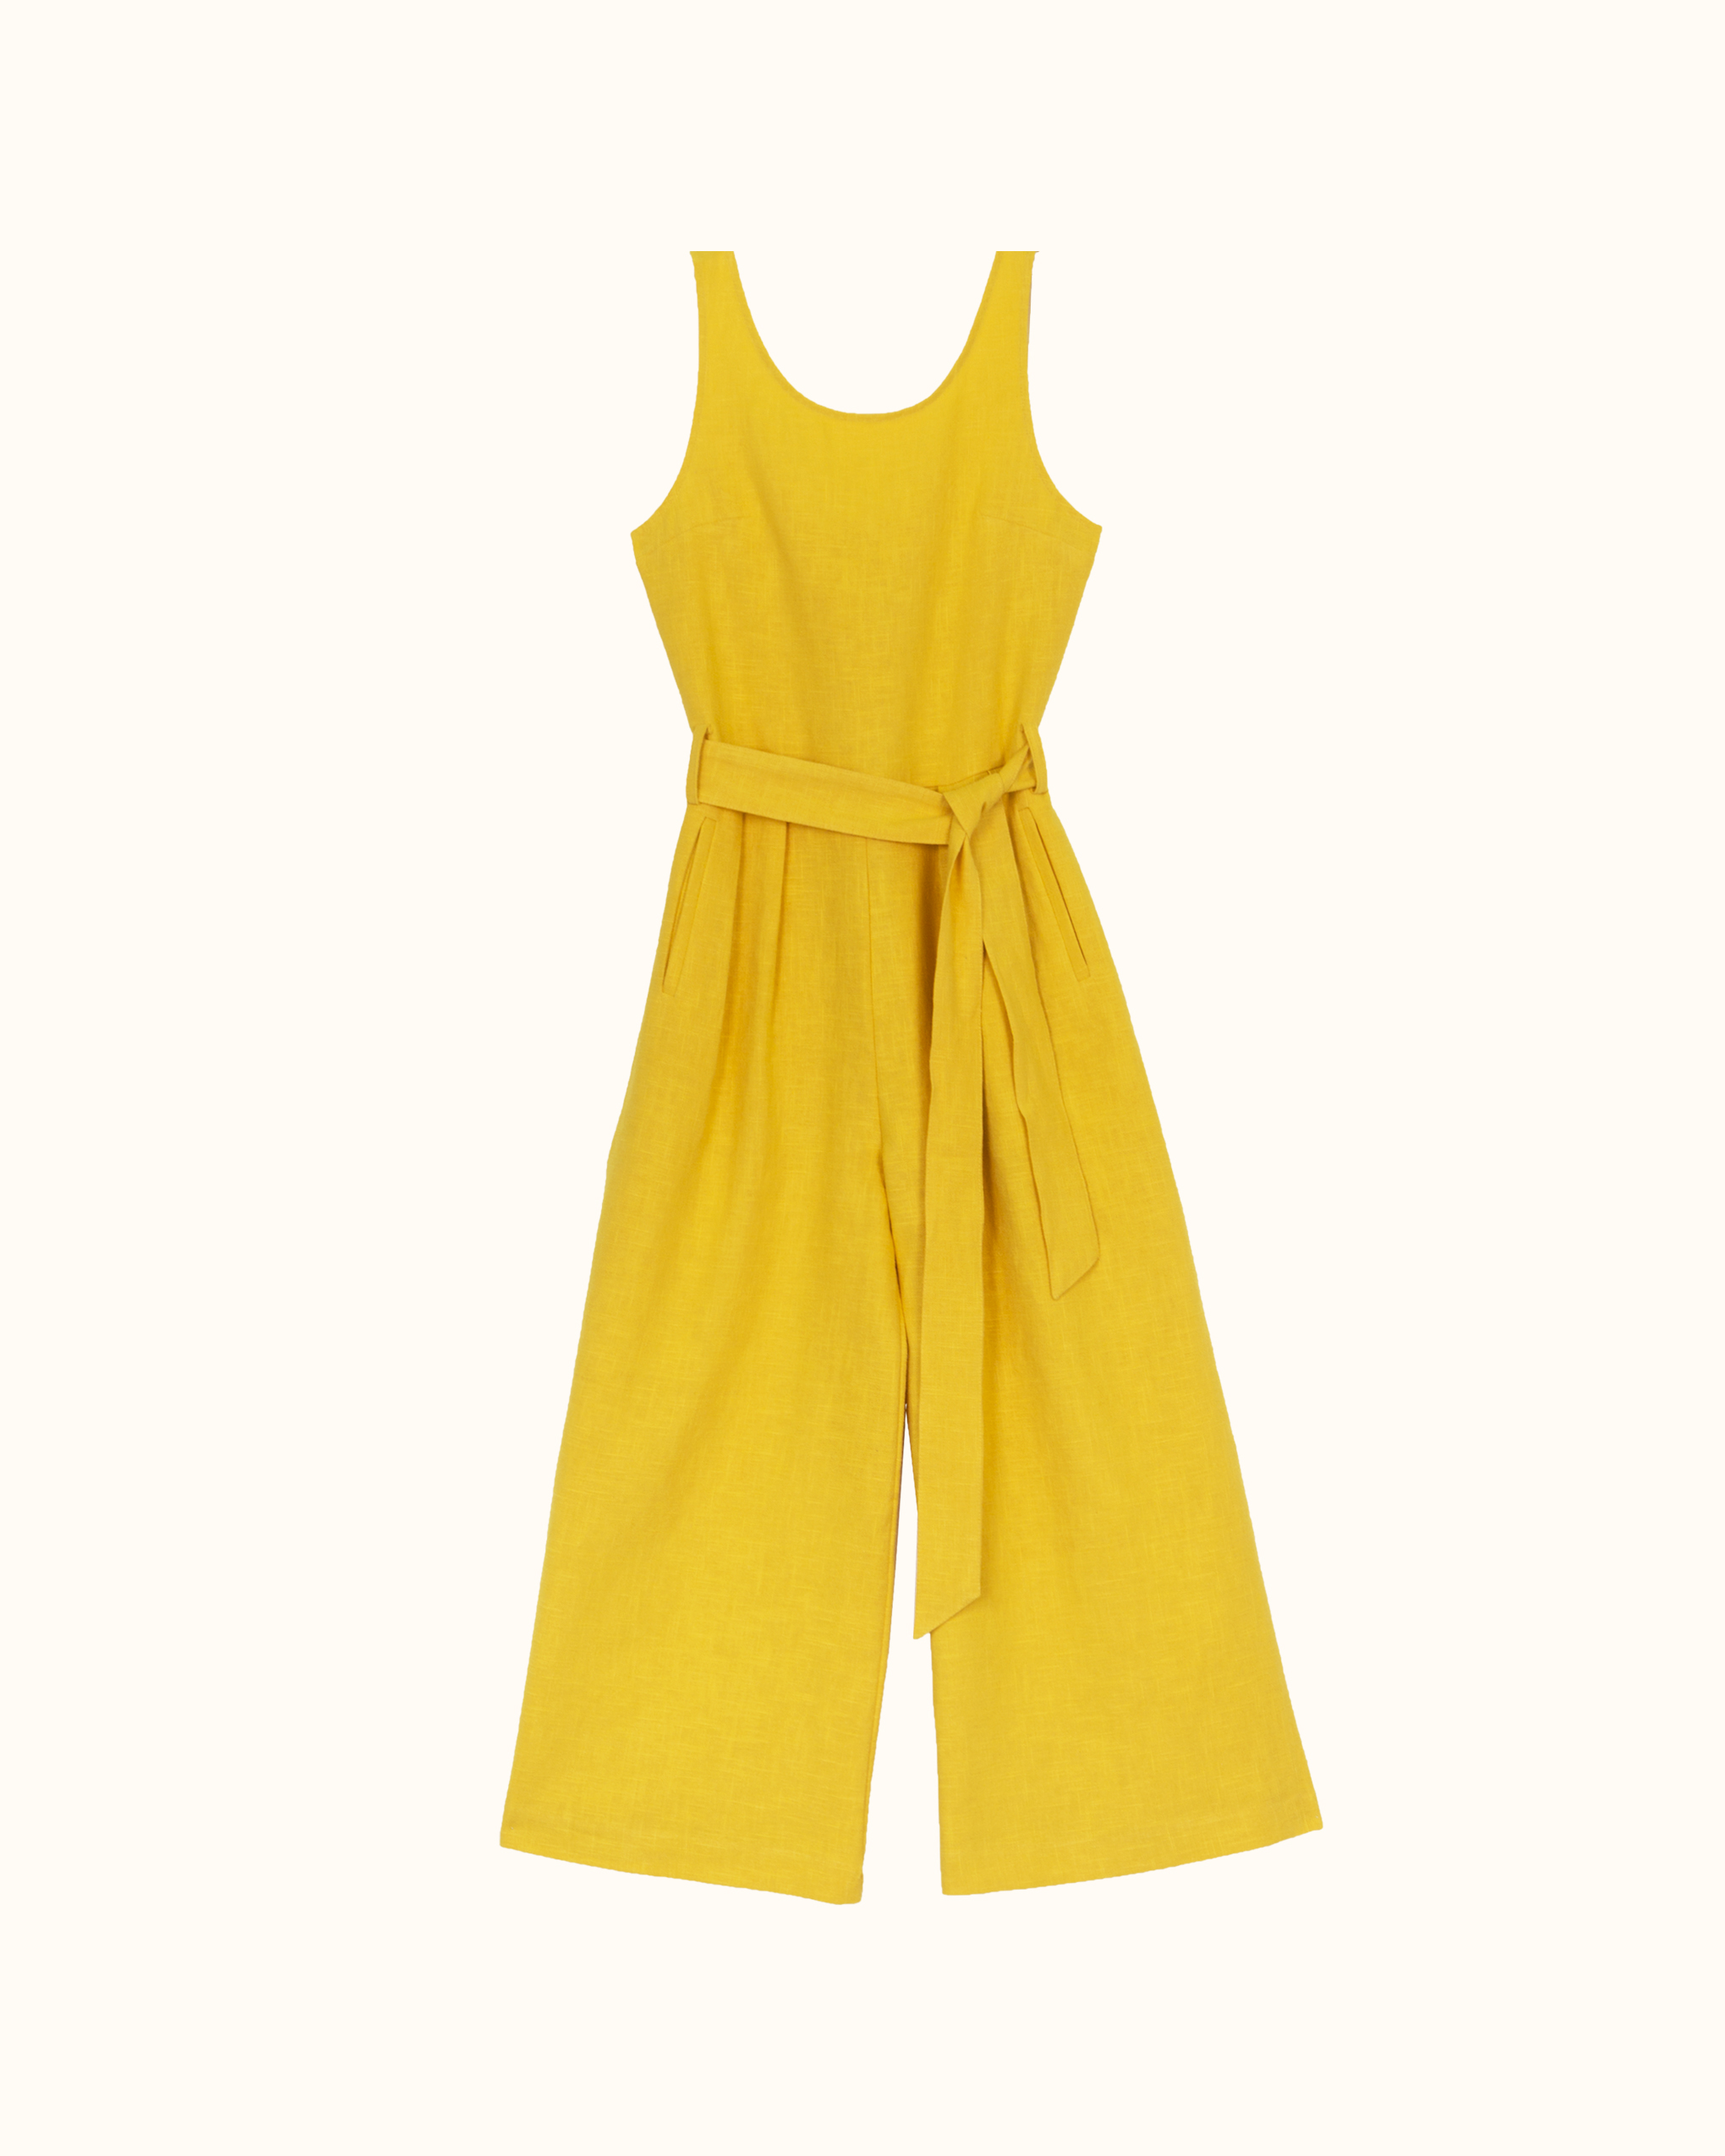 A yellow sleeveless scoop back linen jumpsuit.